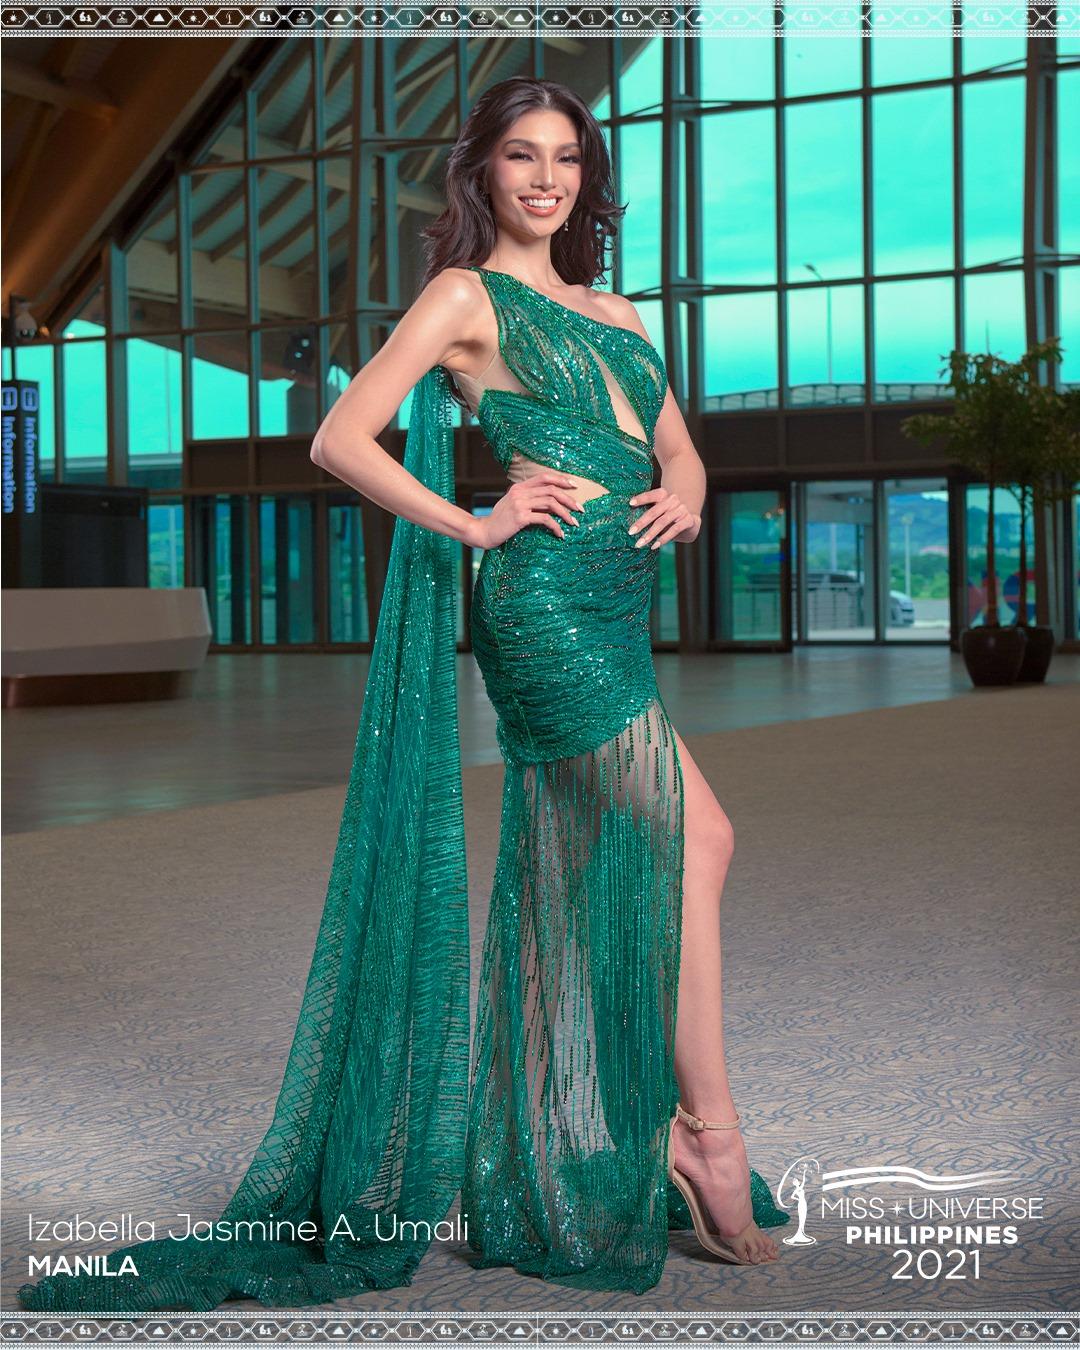 miss-universe-2021-manila-izabella-jasmine-umali-evening